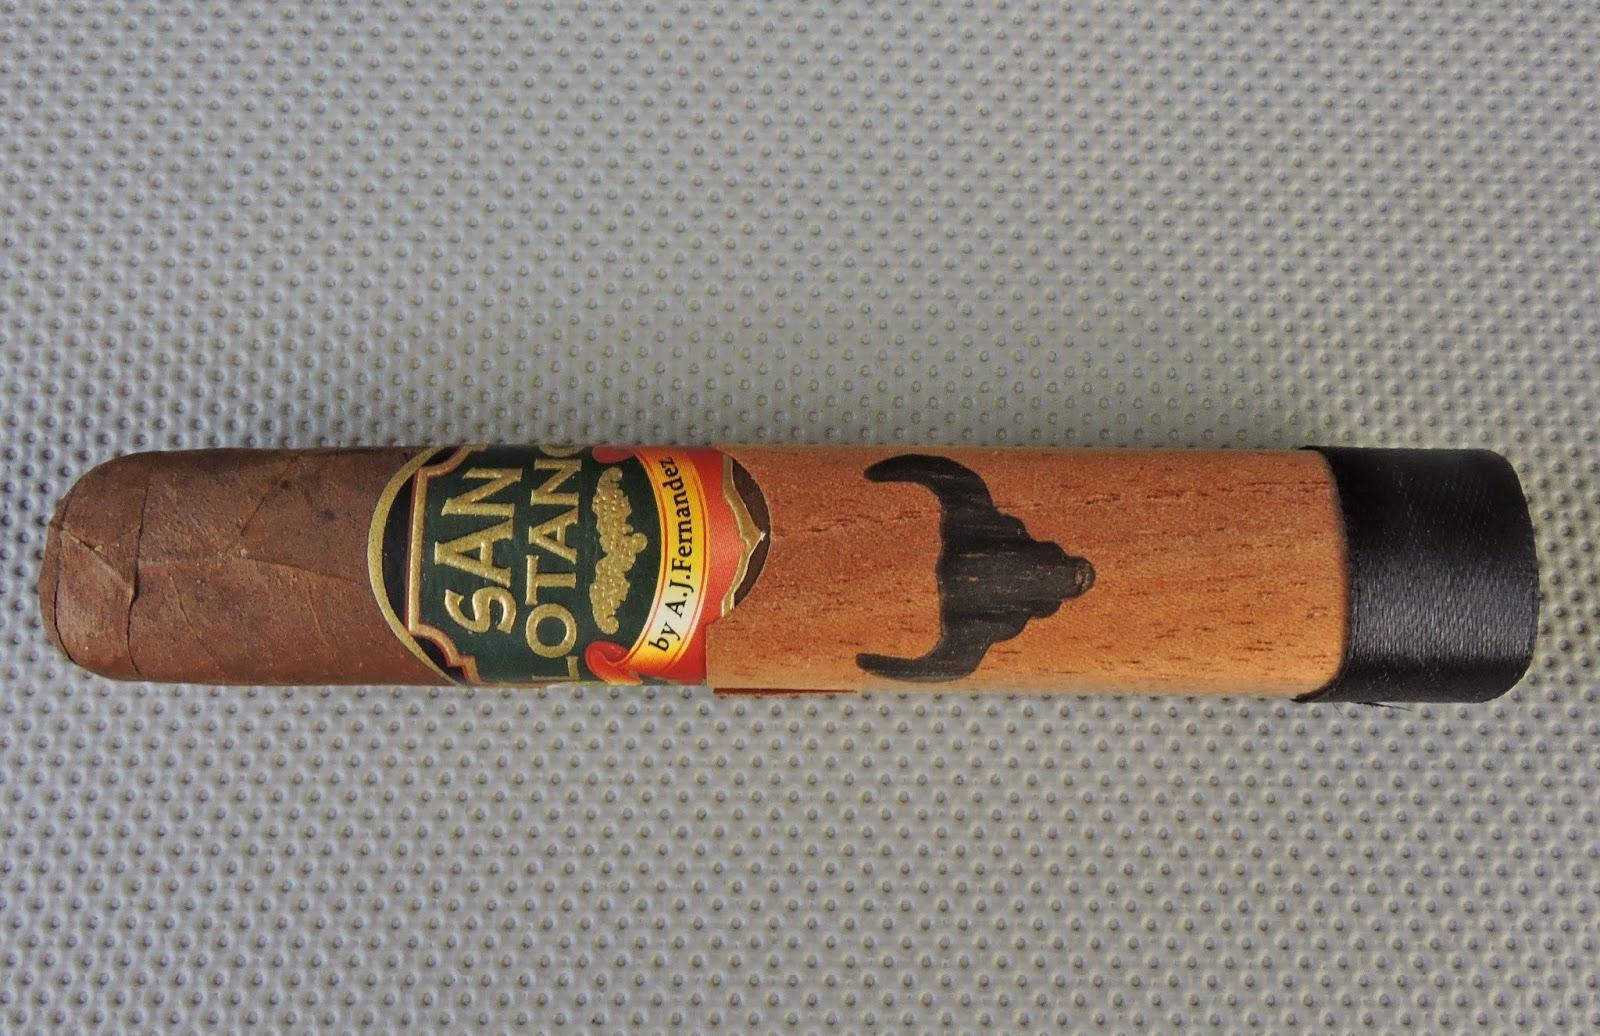 Cigar Review: San Lotano – The Bull Robusto by A.J. Fernandez Cigars